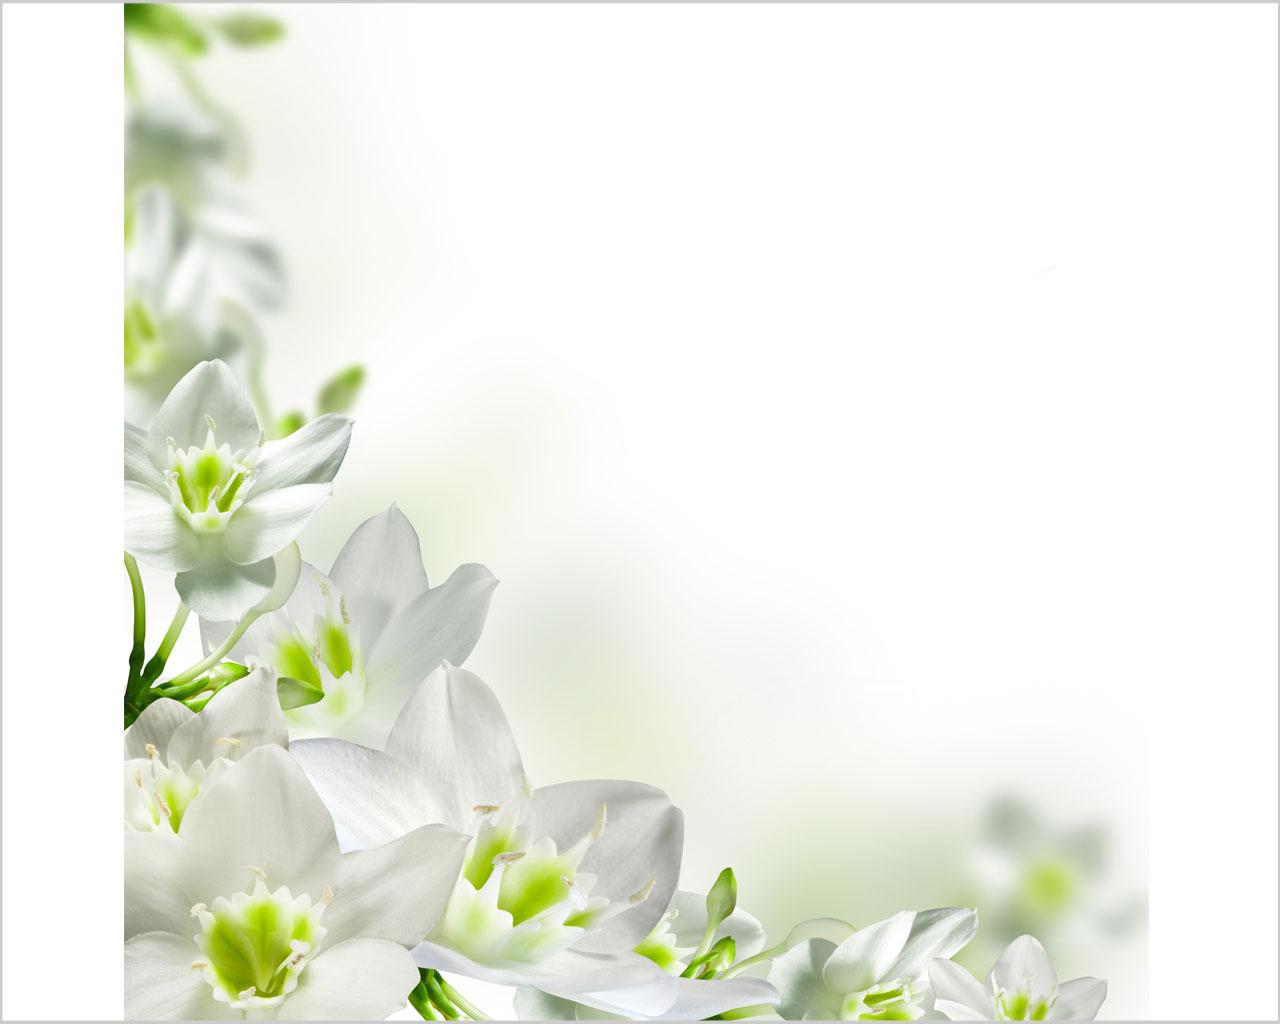 Candidi fiori bianchi fiori stampa su tela interni for Cornici foto bianche